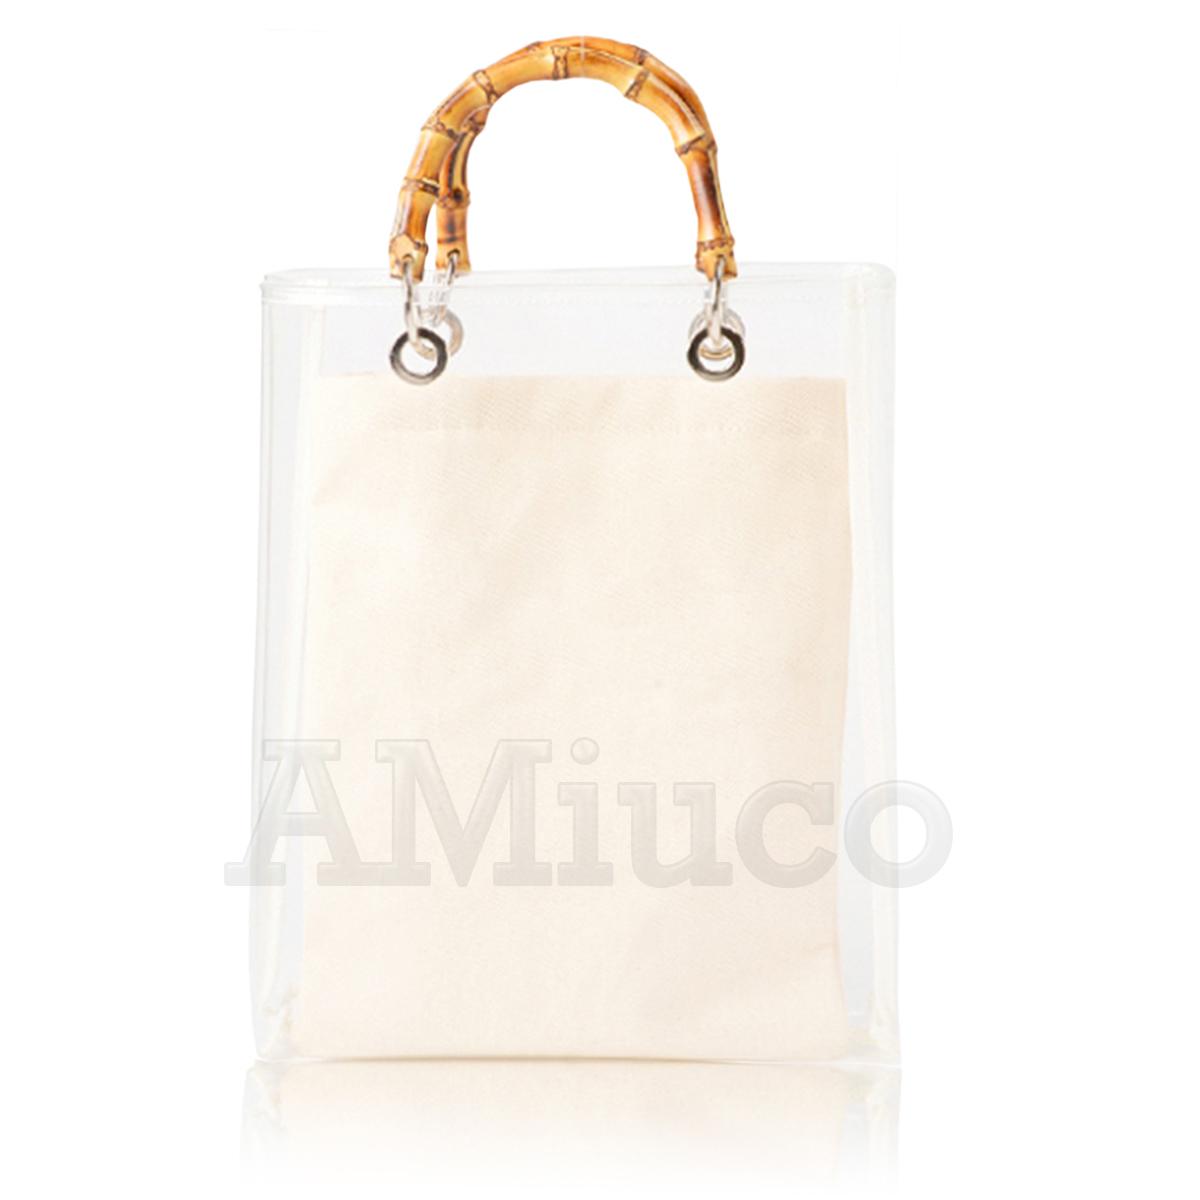 7ebc178bb8e2 Ladys Bamboo Bag Transparent PVC Soft Clear Jelly Clutch Bag Tote Casual  Handbag